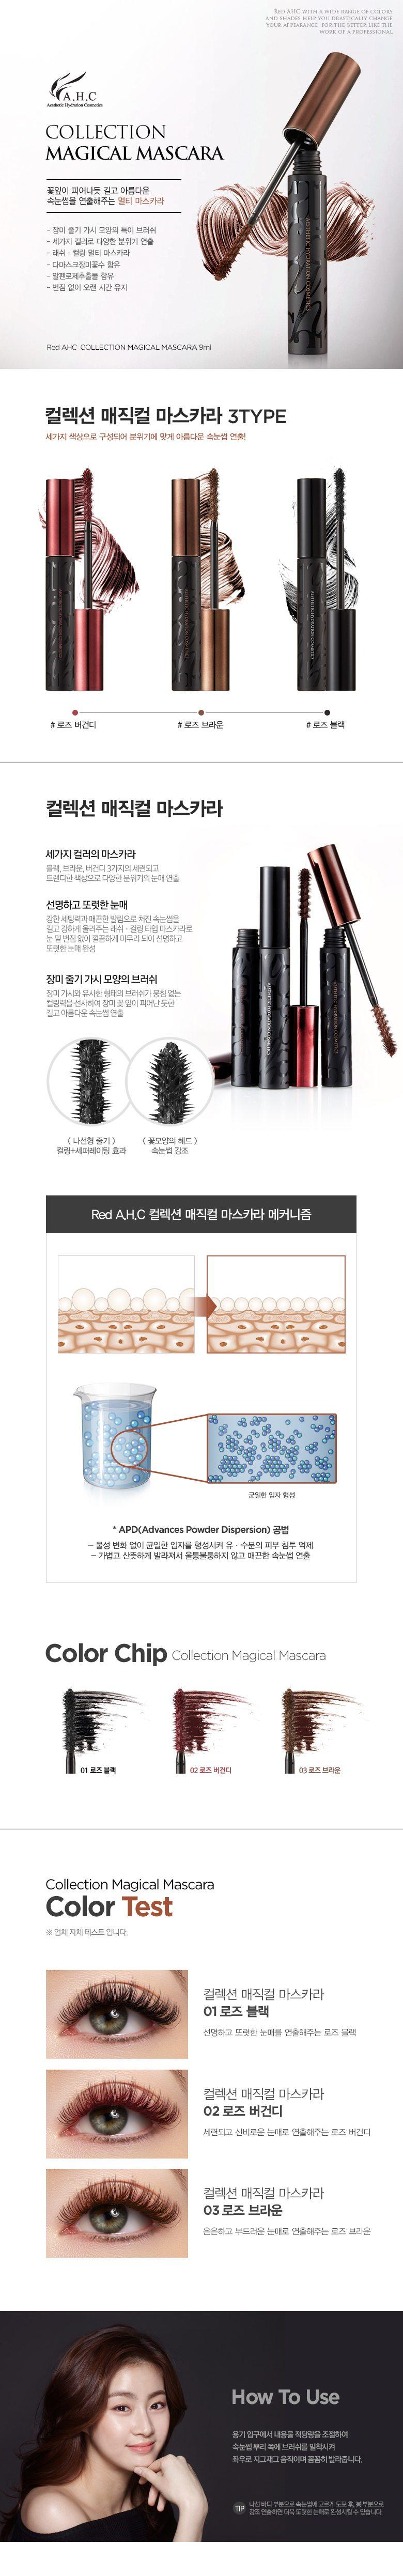 AHC Collection Magical Mascara 9ml malaysia singapore indonesia